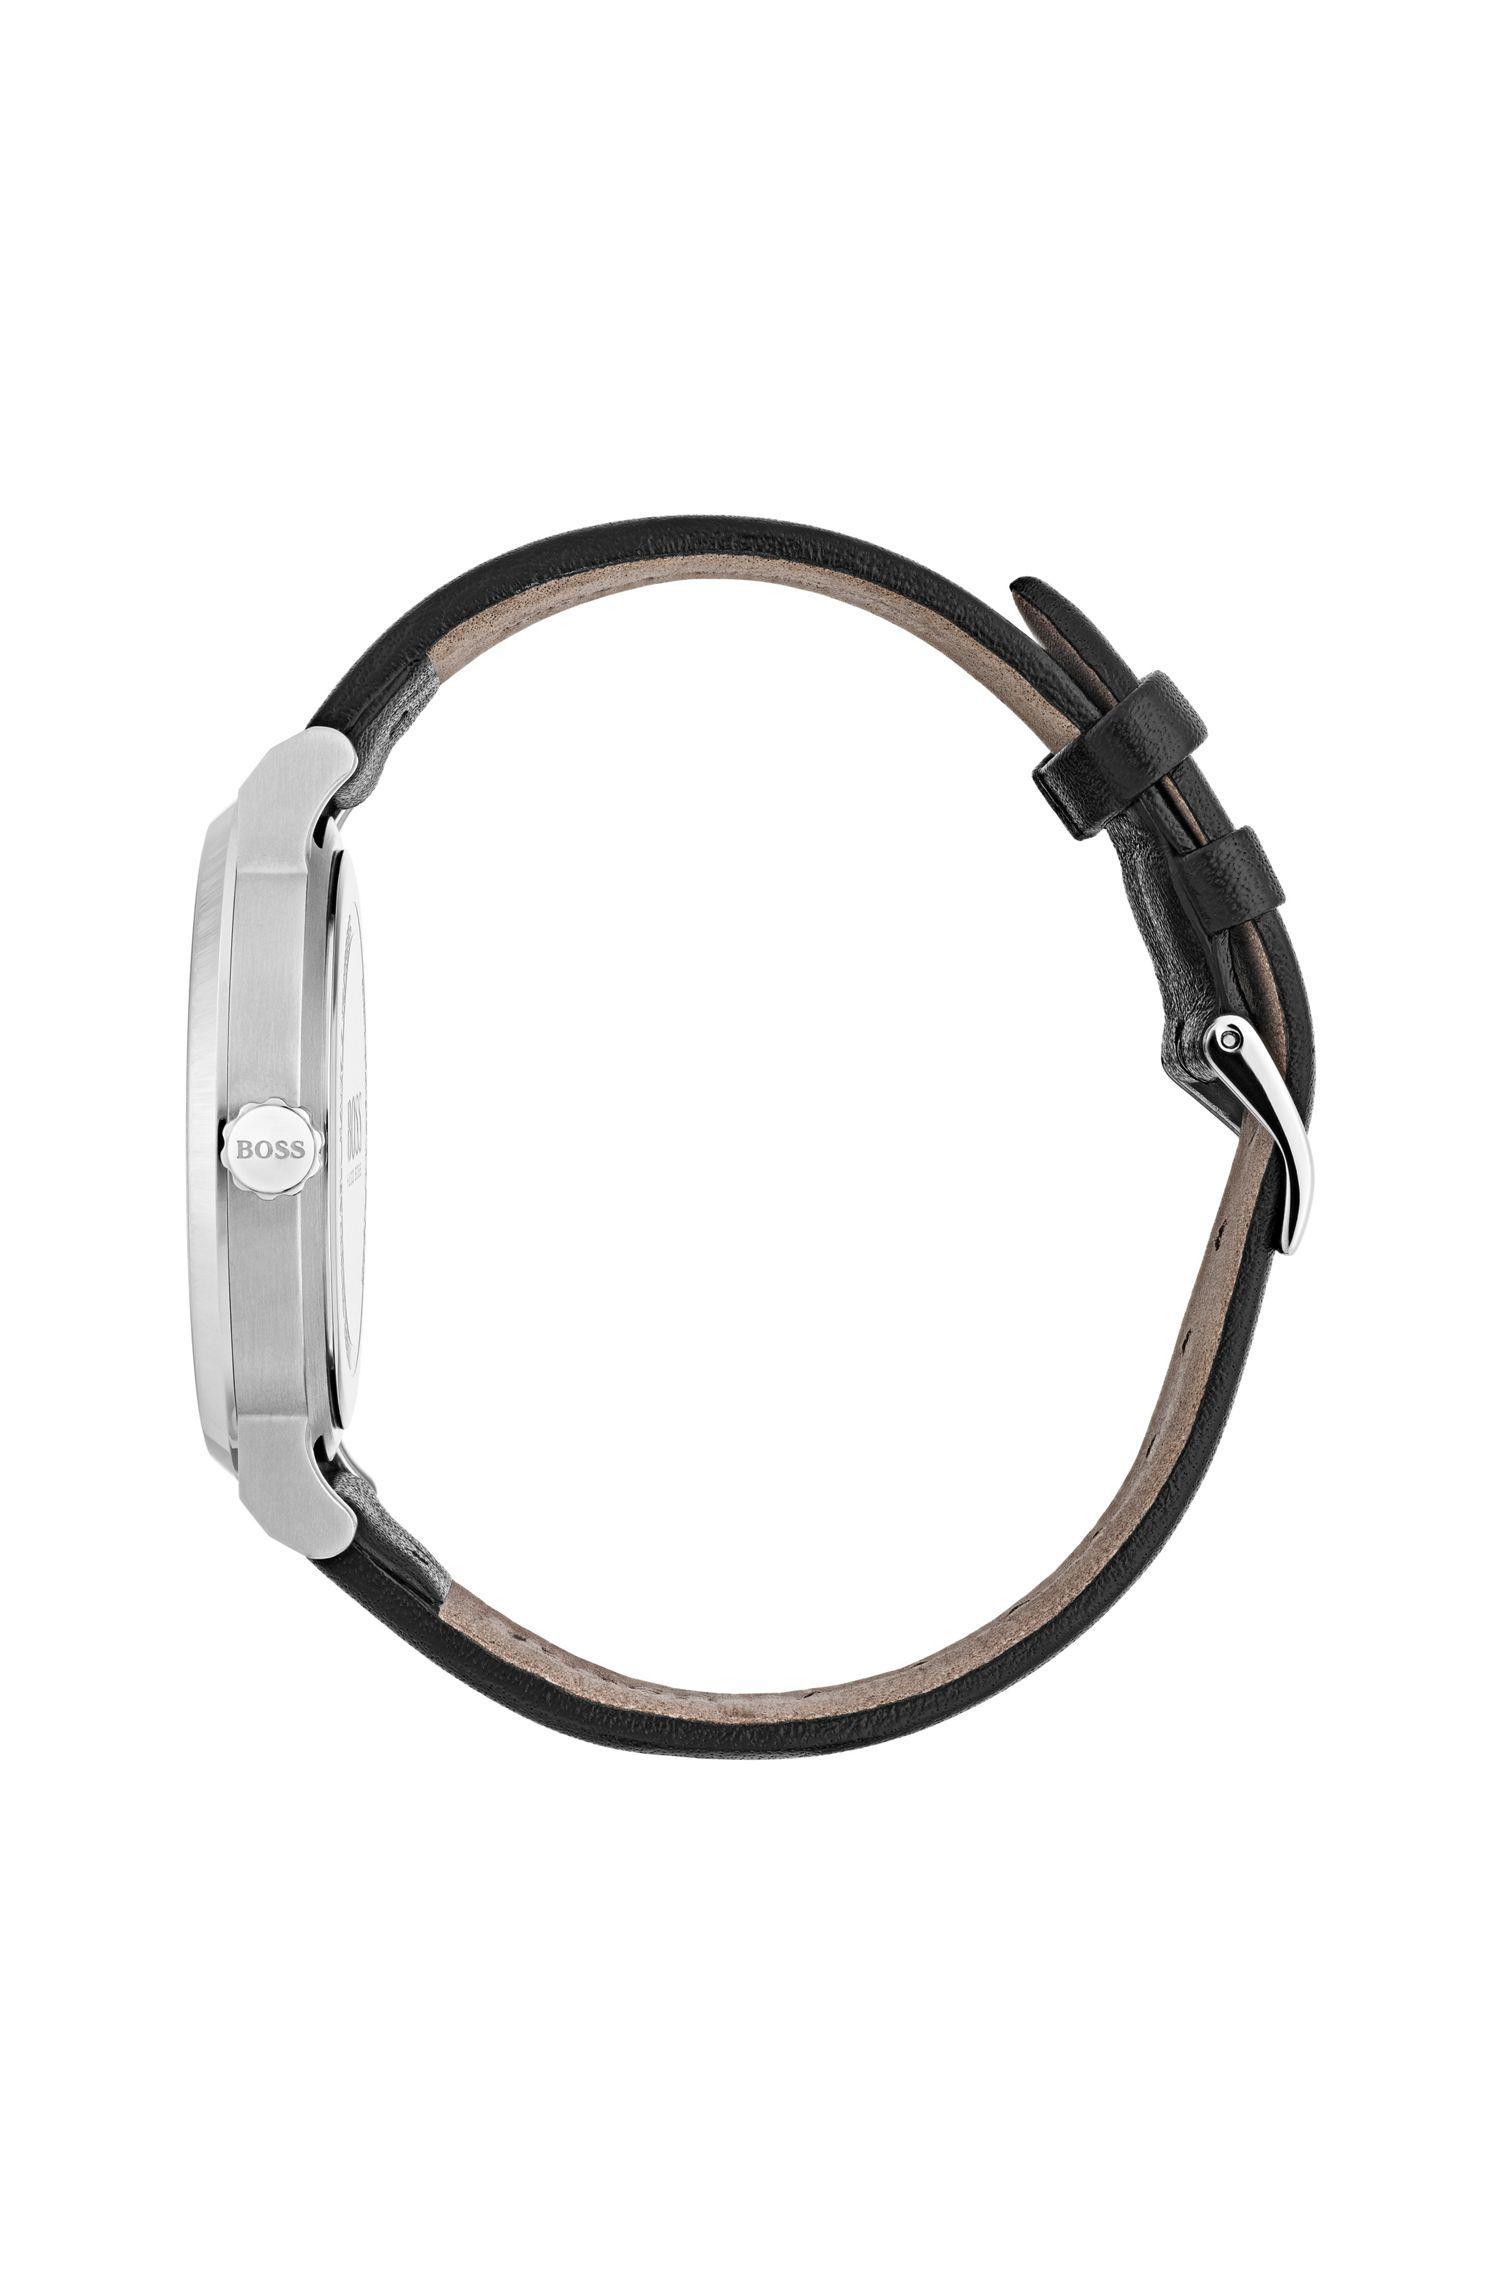 9533b0a4f5d80d BOSS Minimalist Stainless-steel Watch With Matt Black Dial And ...